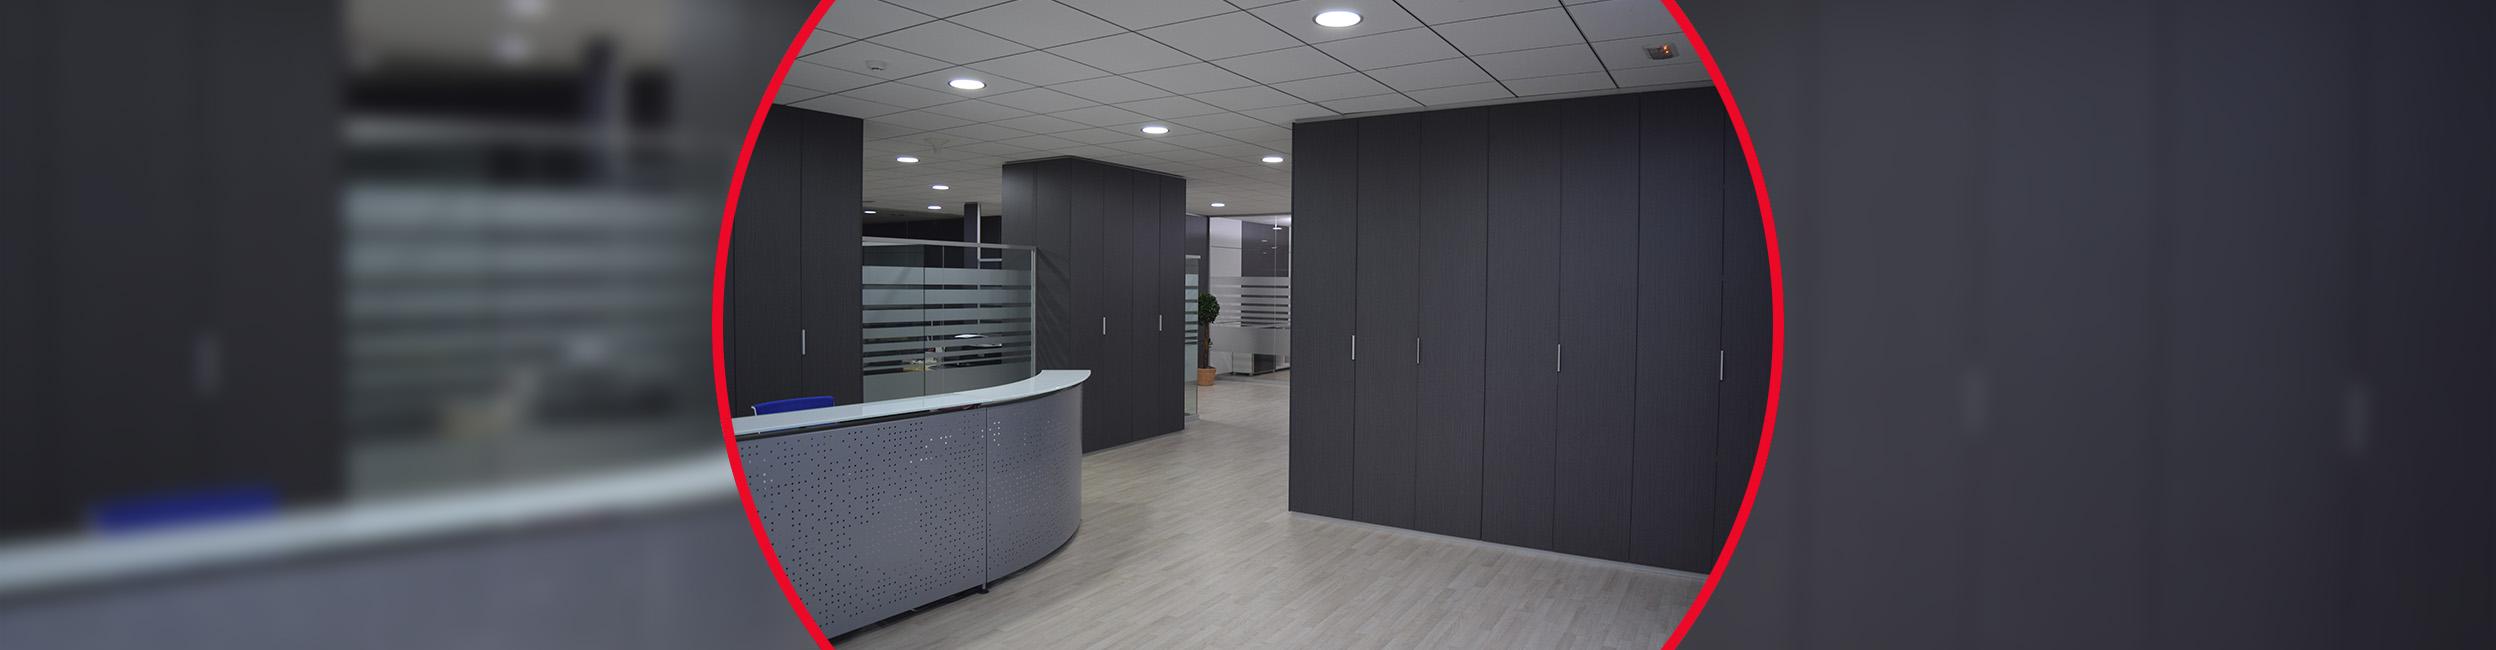 Tabiques para armarios de oficina en alicante murcia for Oficinas prop valencia